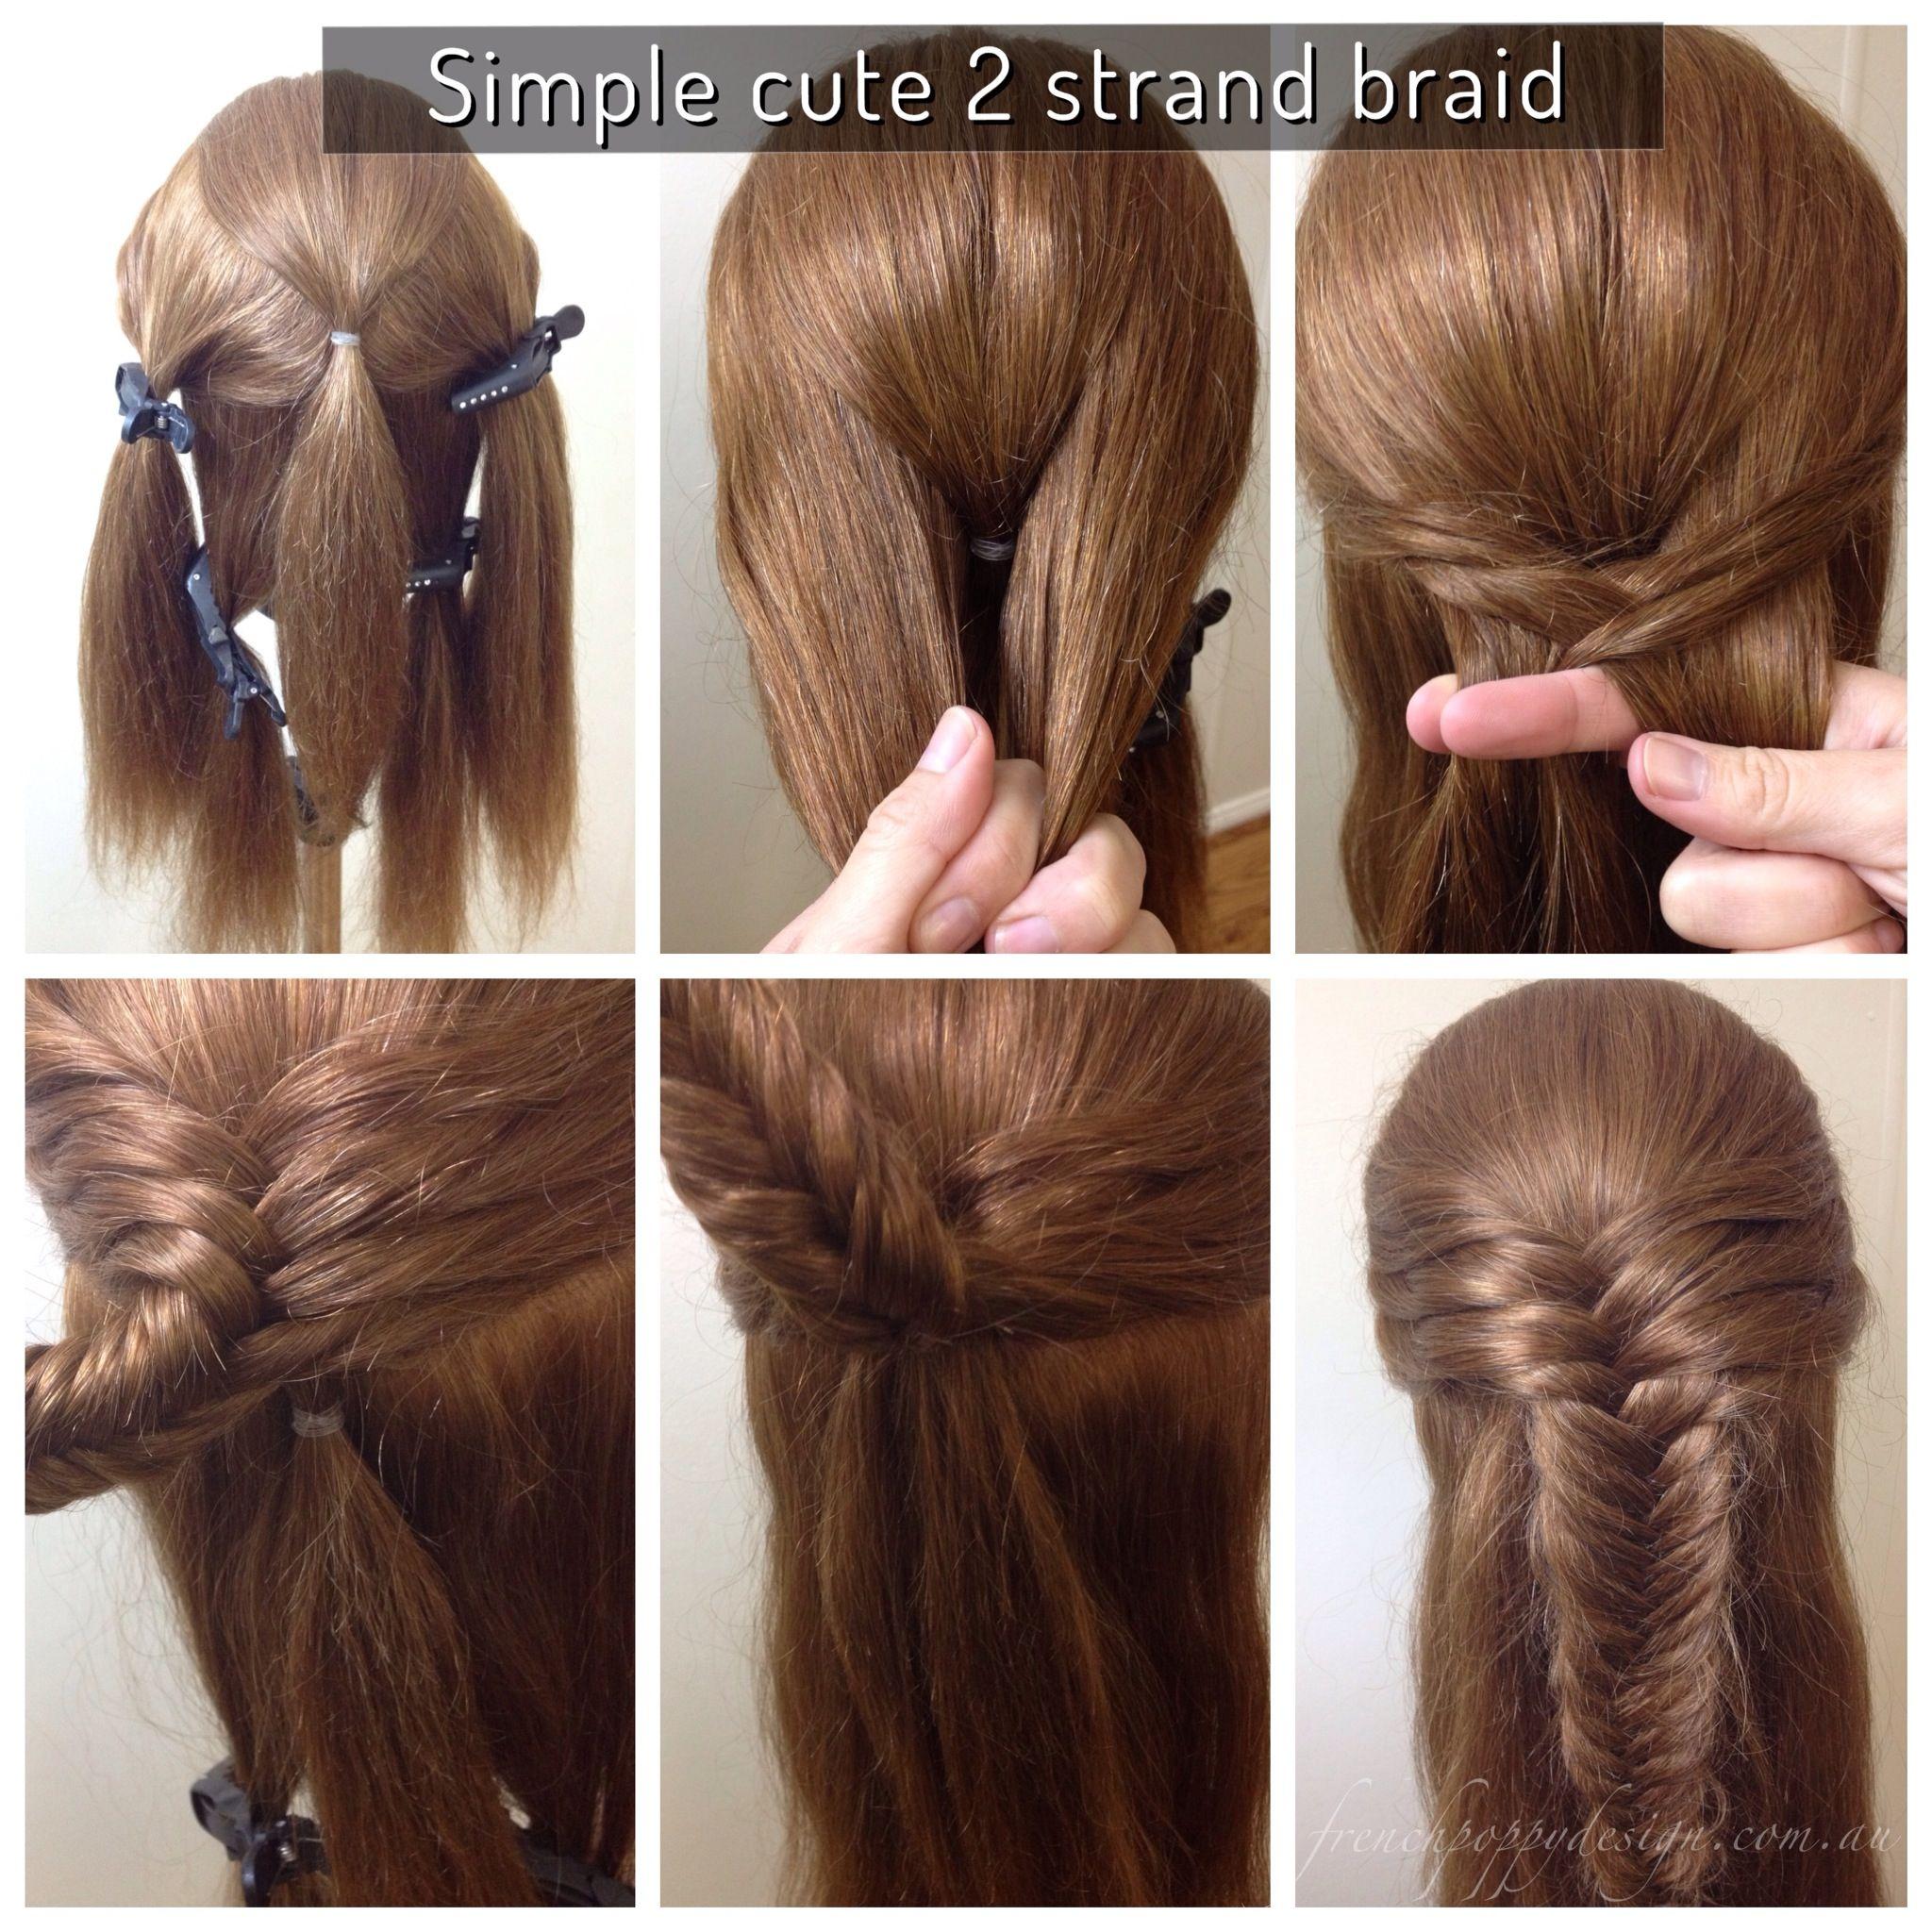 cute and easy hair design created